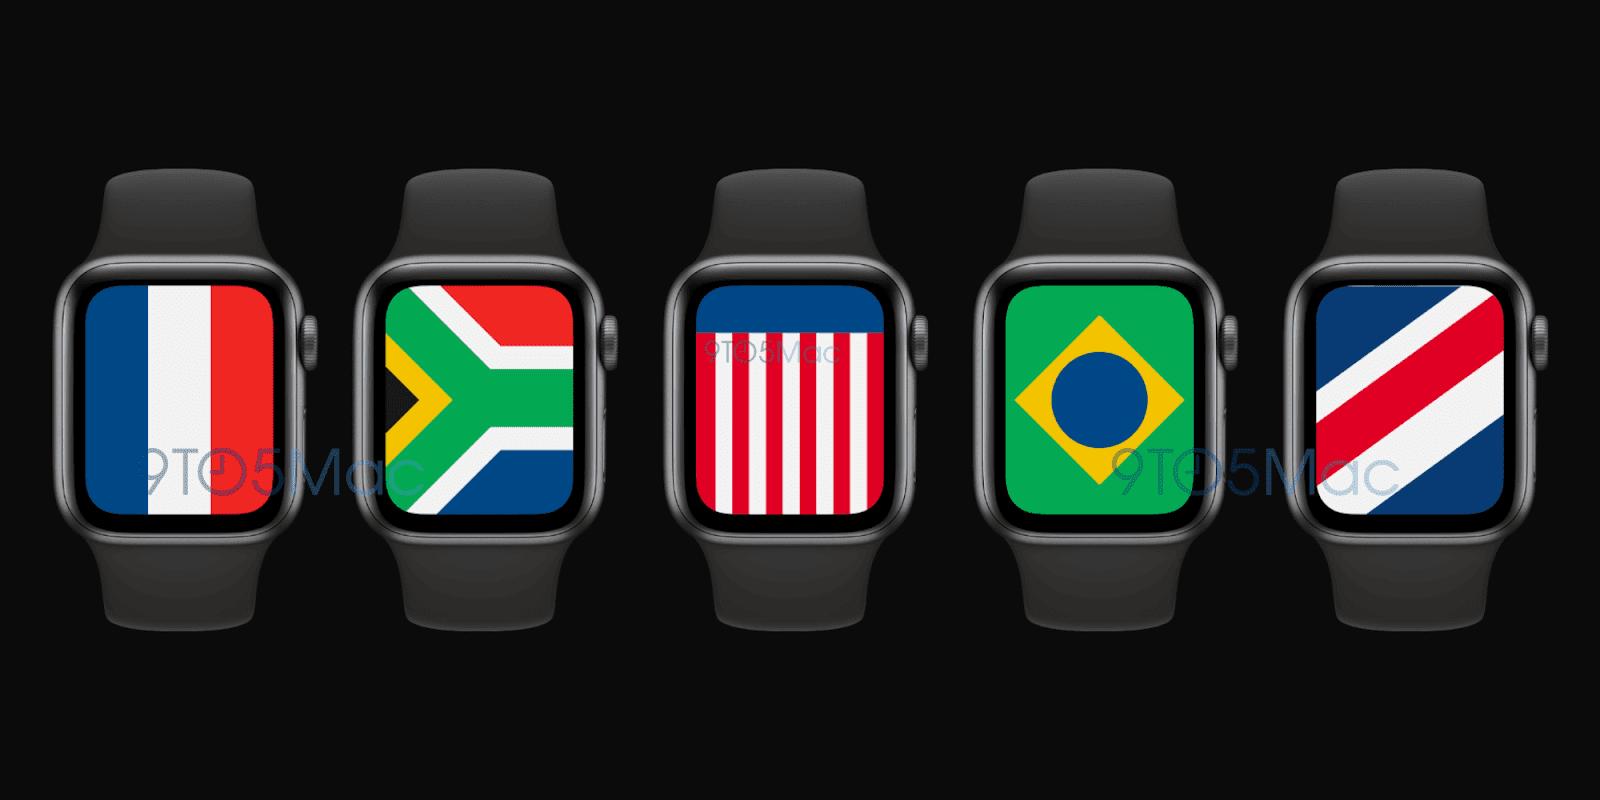 Apple Watch 加入全新國旗錶盤:展示各國象徵與標誌